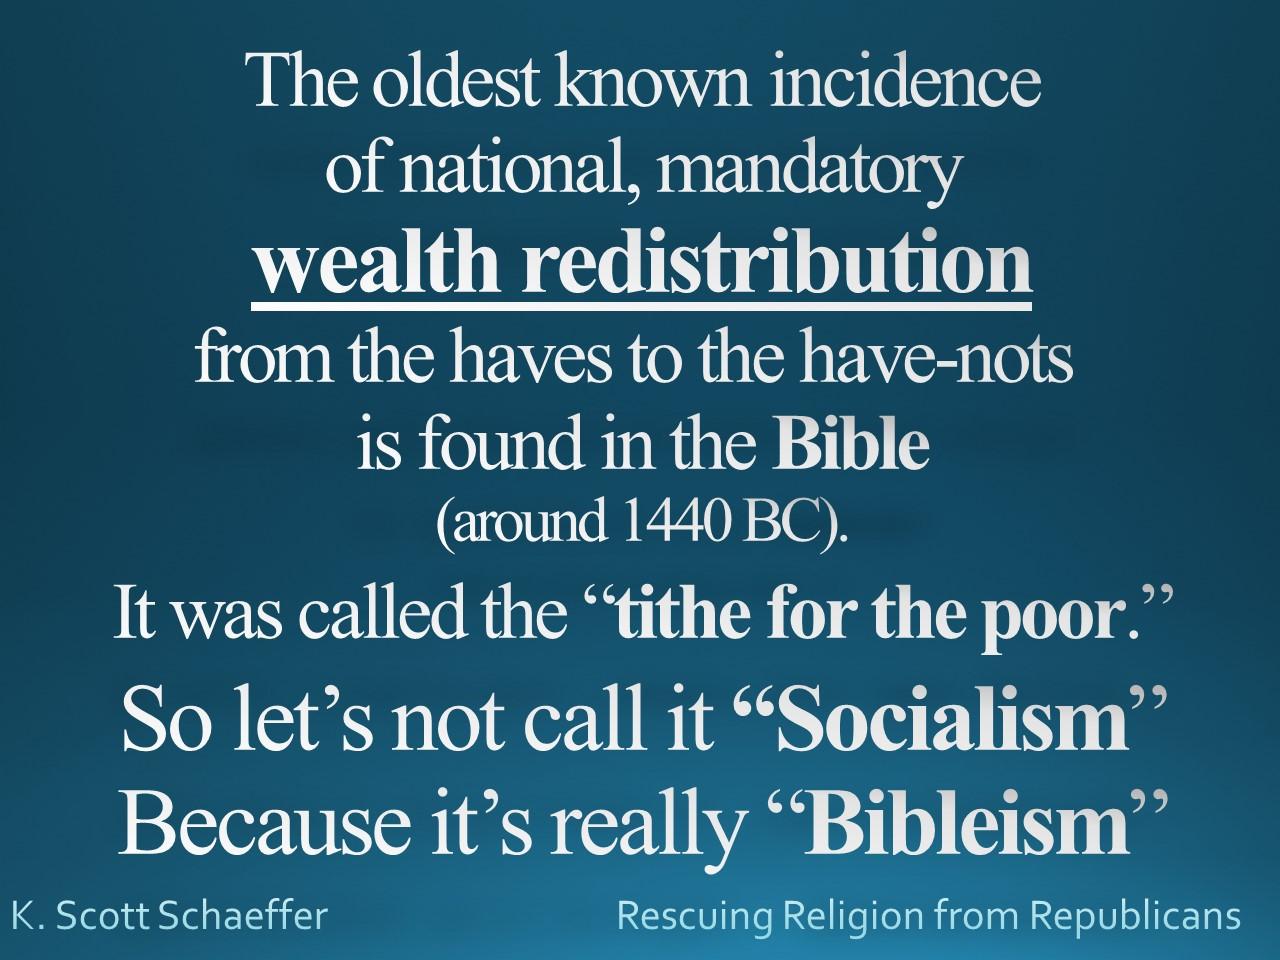 Socialism - Bibleism